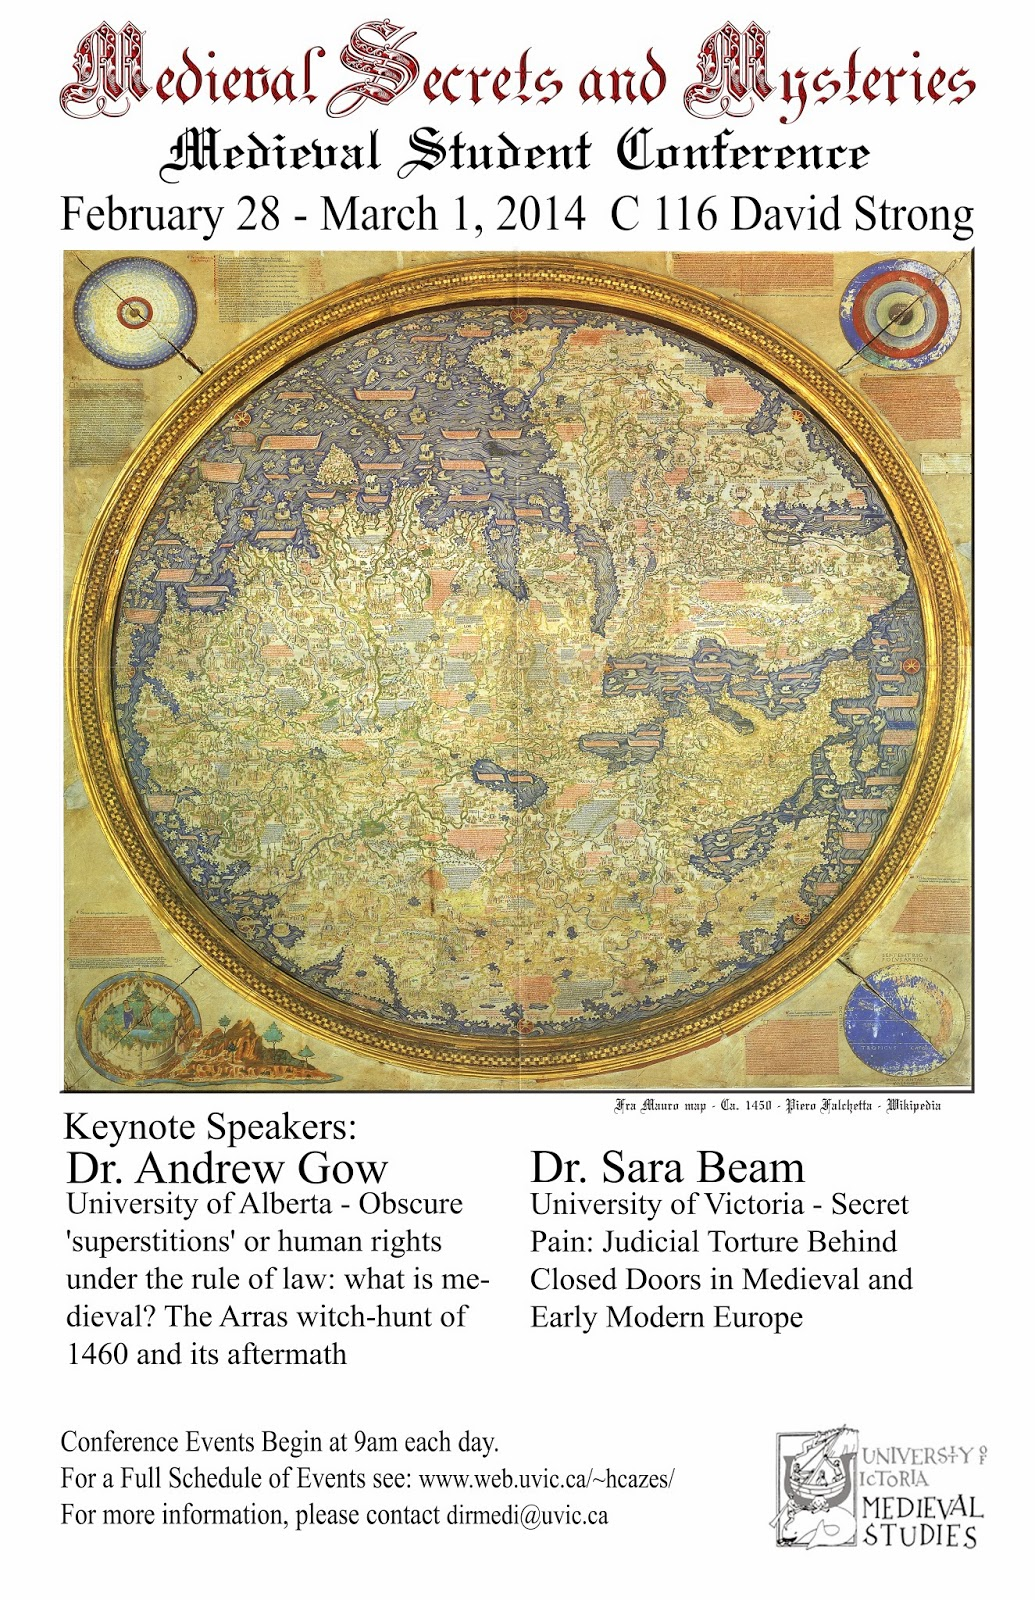 Medieval Studies Newsletter: Florilegium